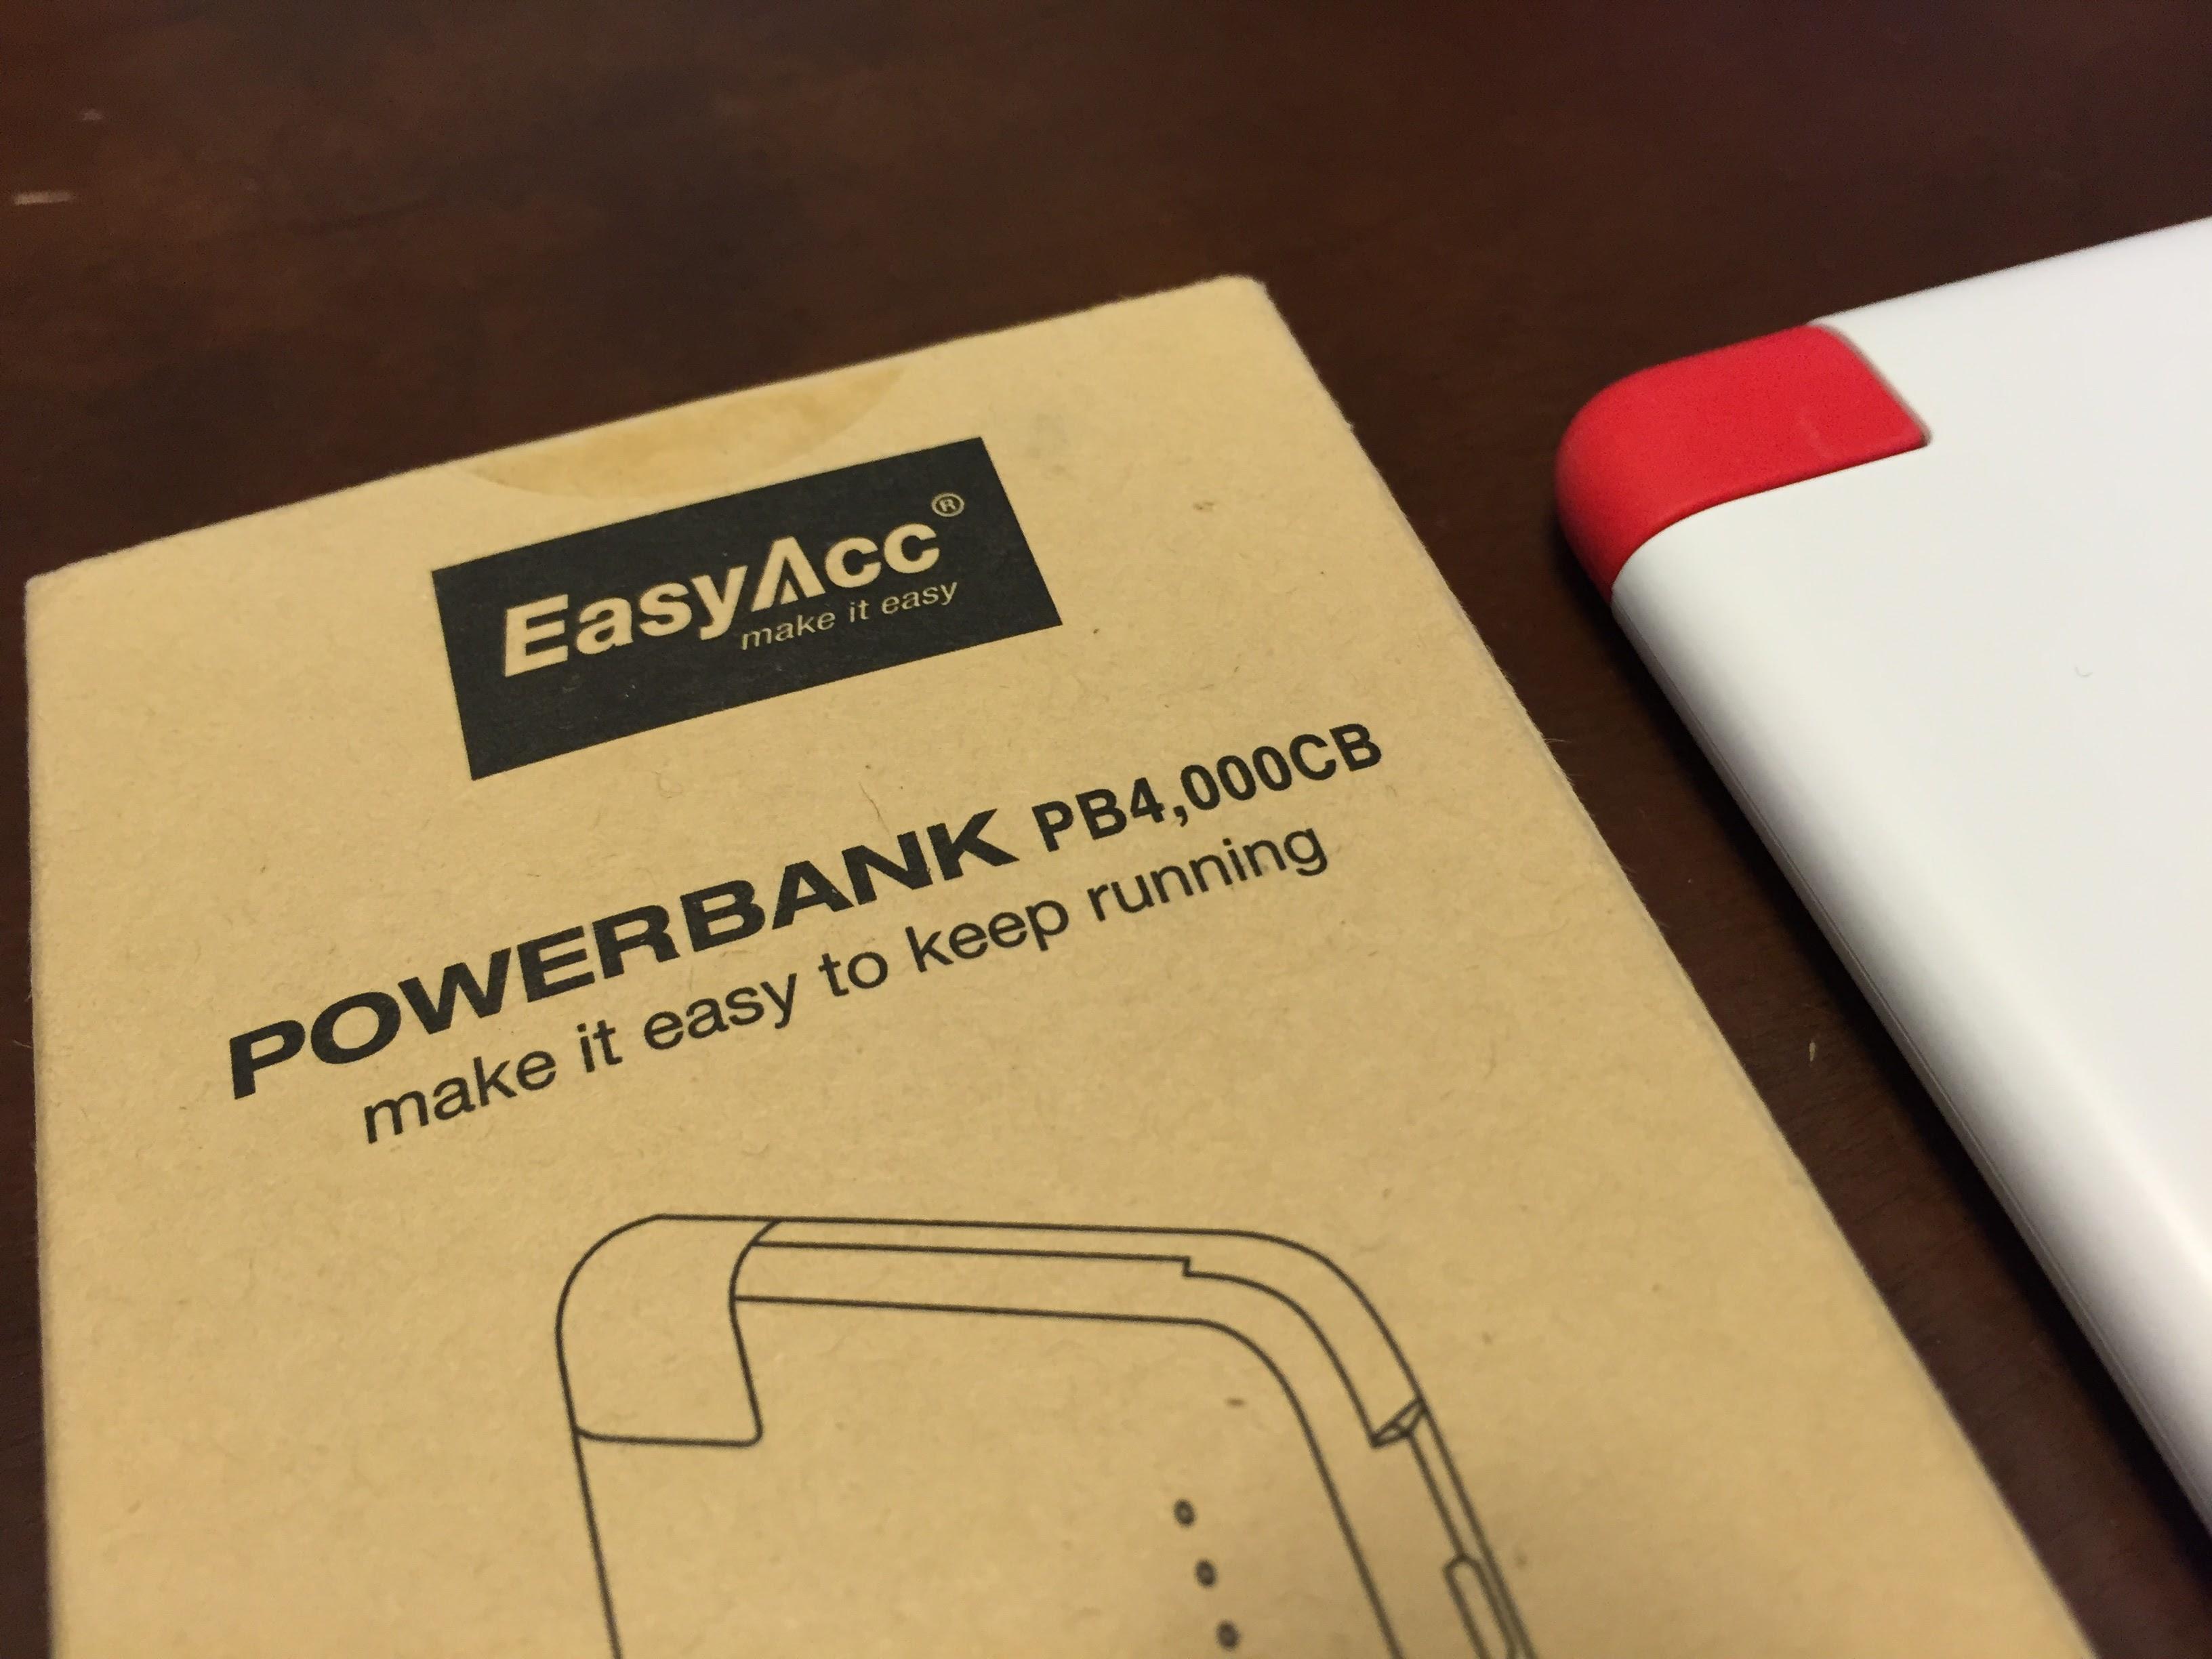 0995-201508_EasyAcc POWER BANK PB4000CB 03